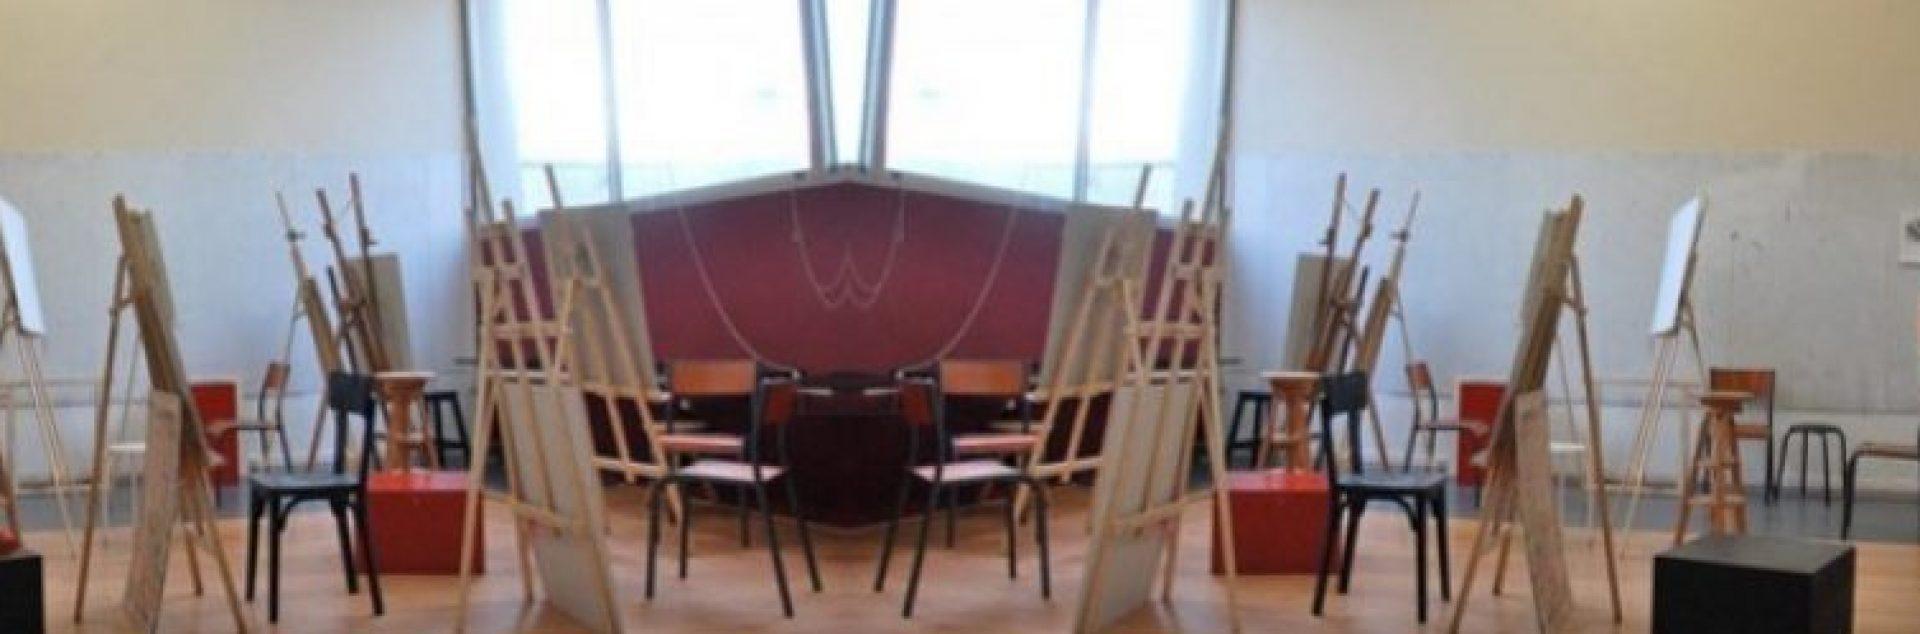 Atelier Norma Trosman